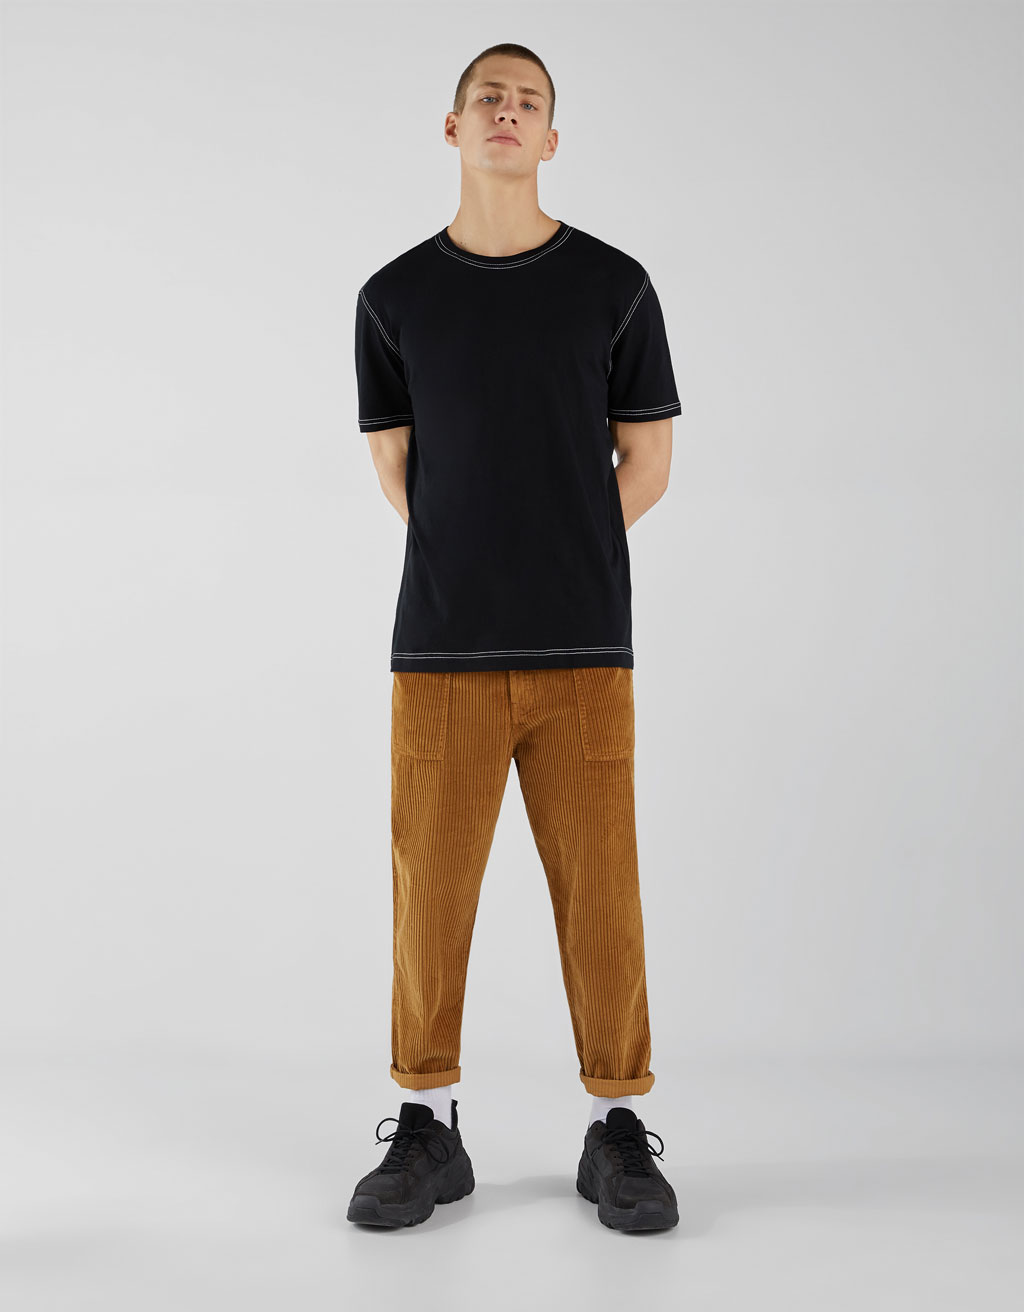 Camiseta con hilo contraste